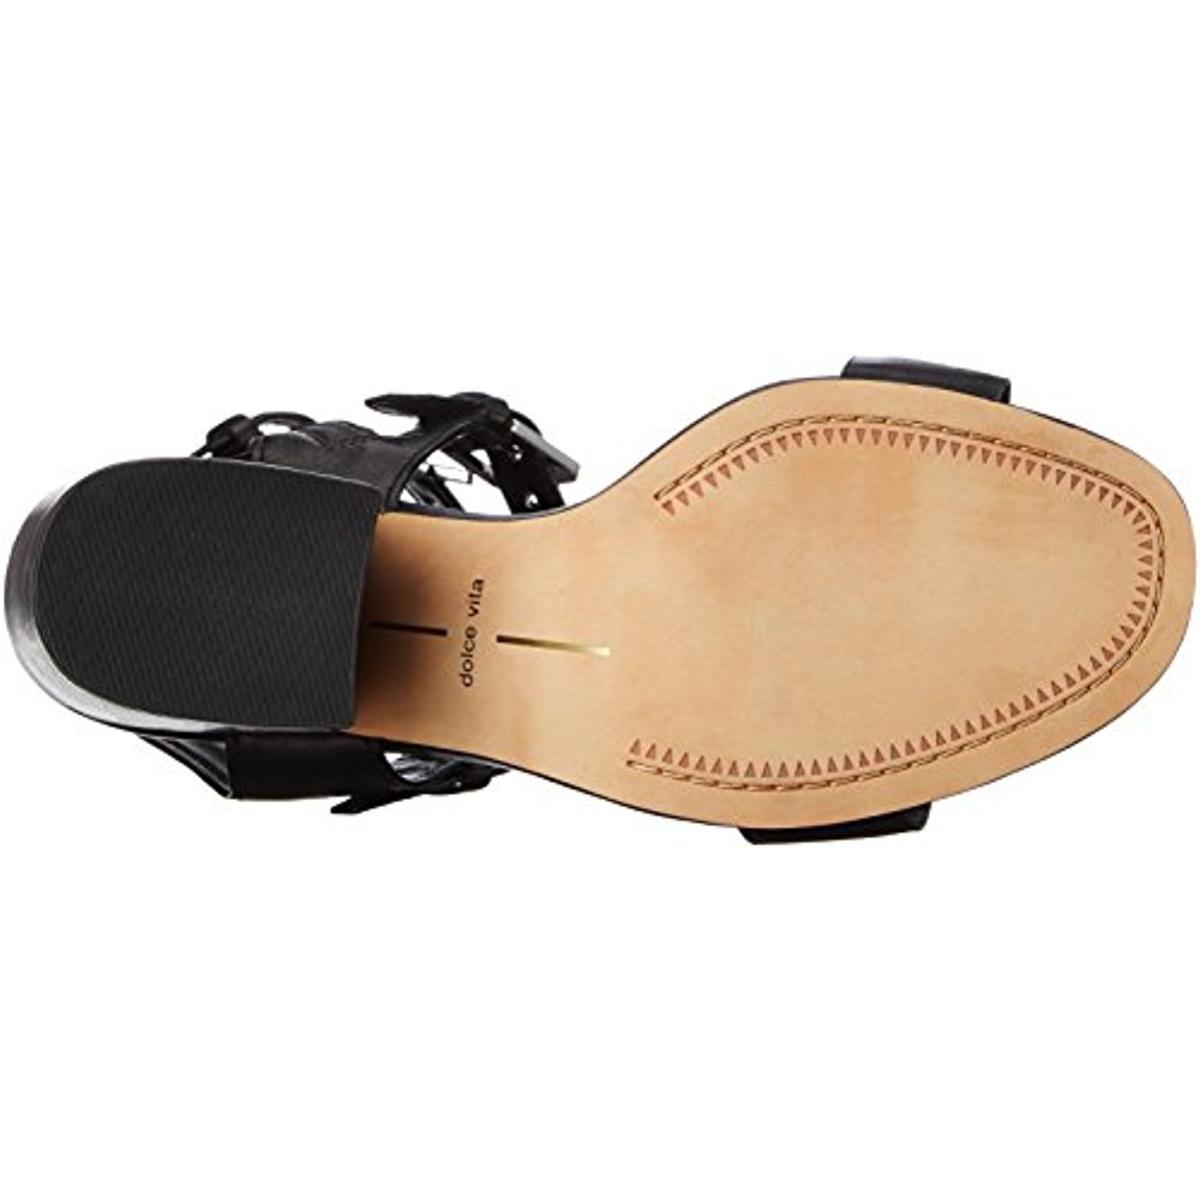 Dolce Vita Damenschuhe Edin Buckle Open Toe 5543 Casual Heels Sandales BHFO 5543 Toe b8bfec